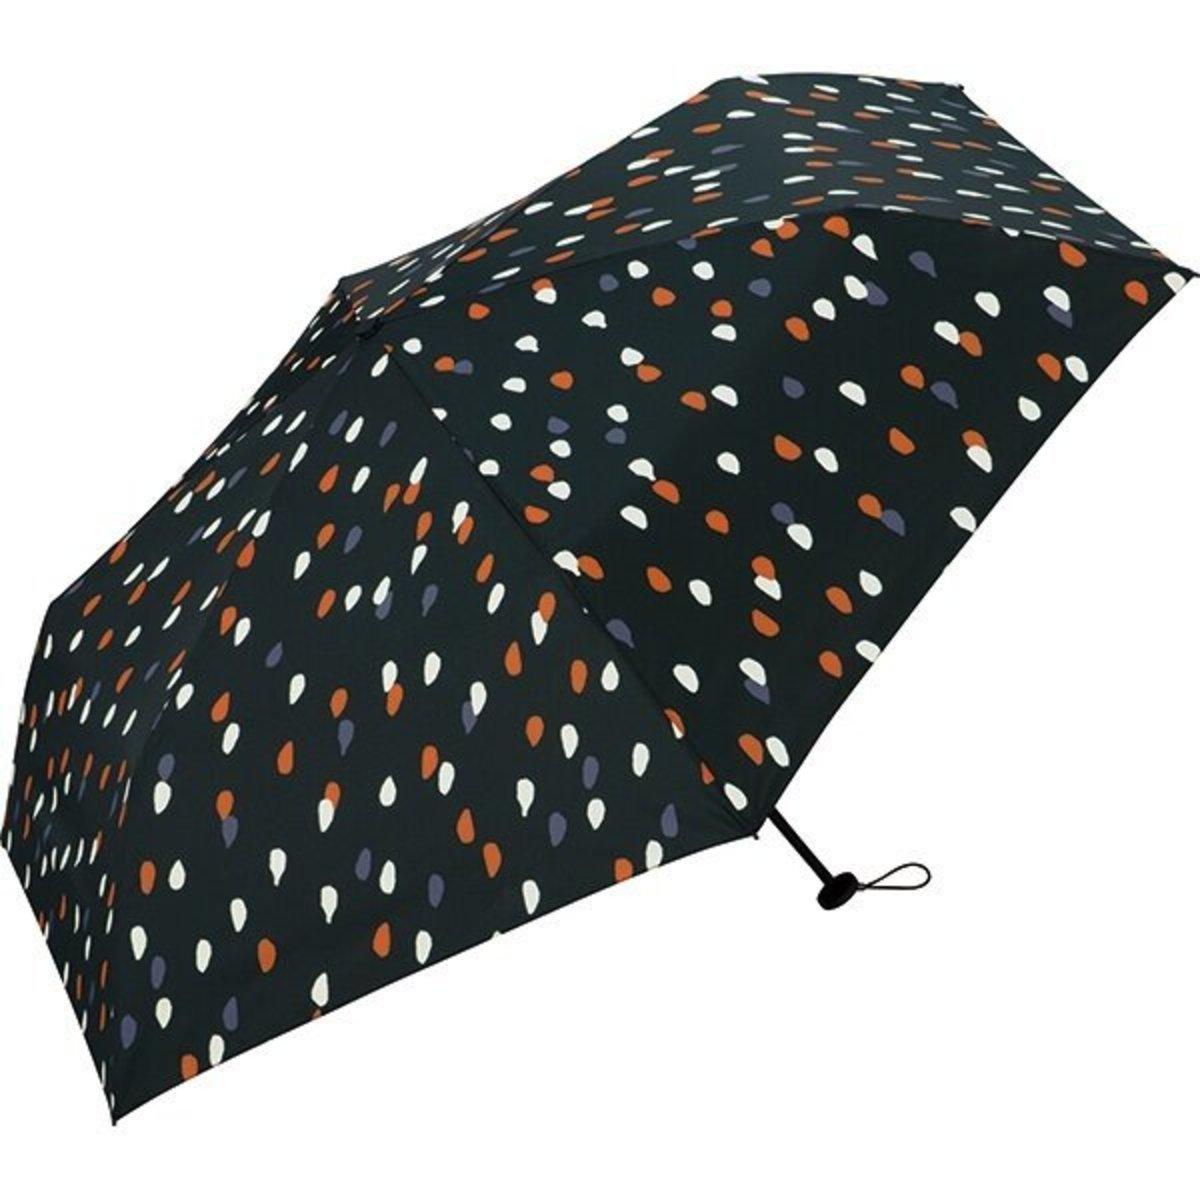 Air Light 120g Easy Open Umbrella - Rainy